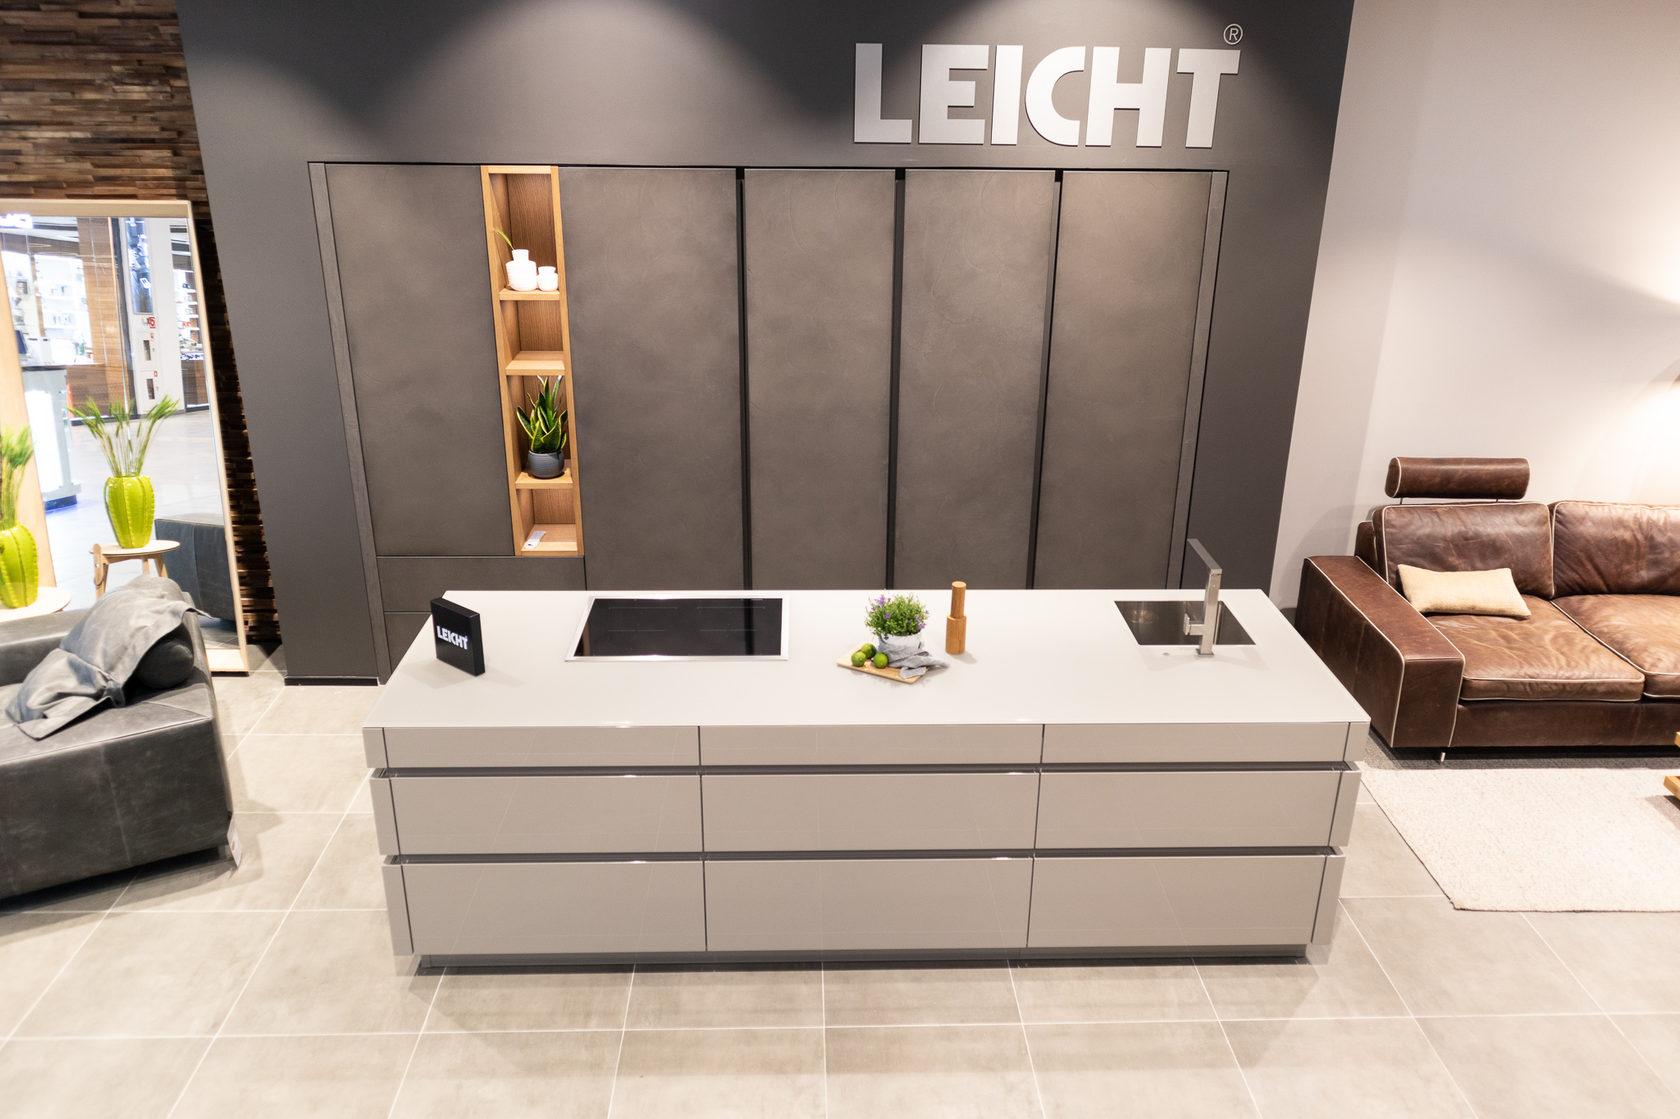 LEICHT Concrete